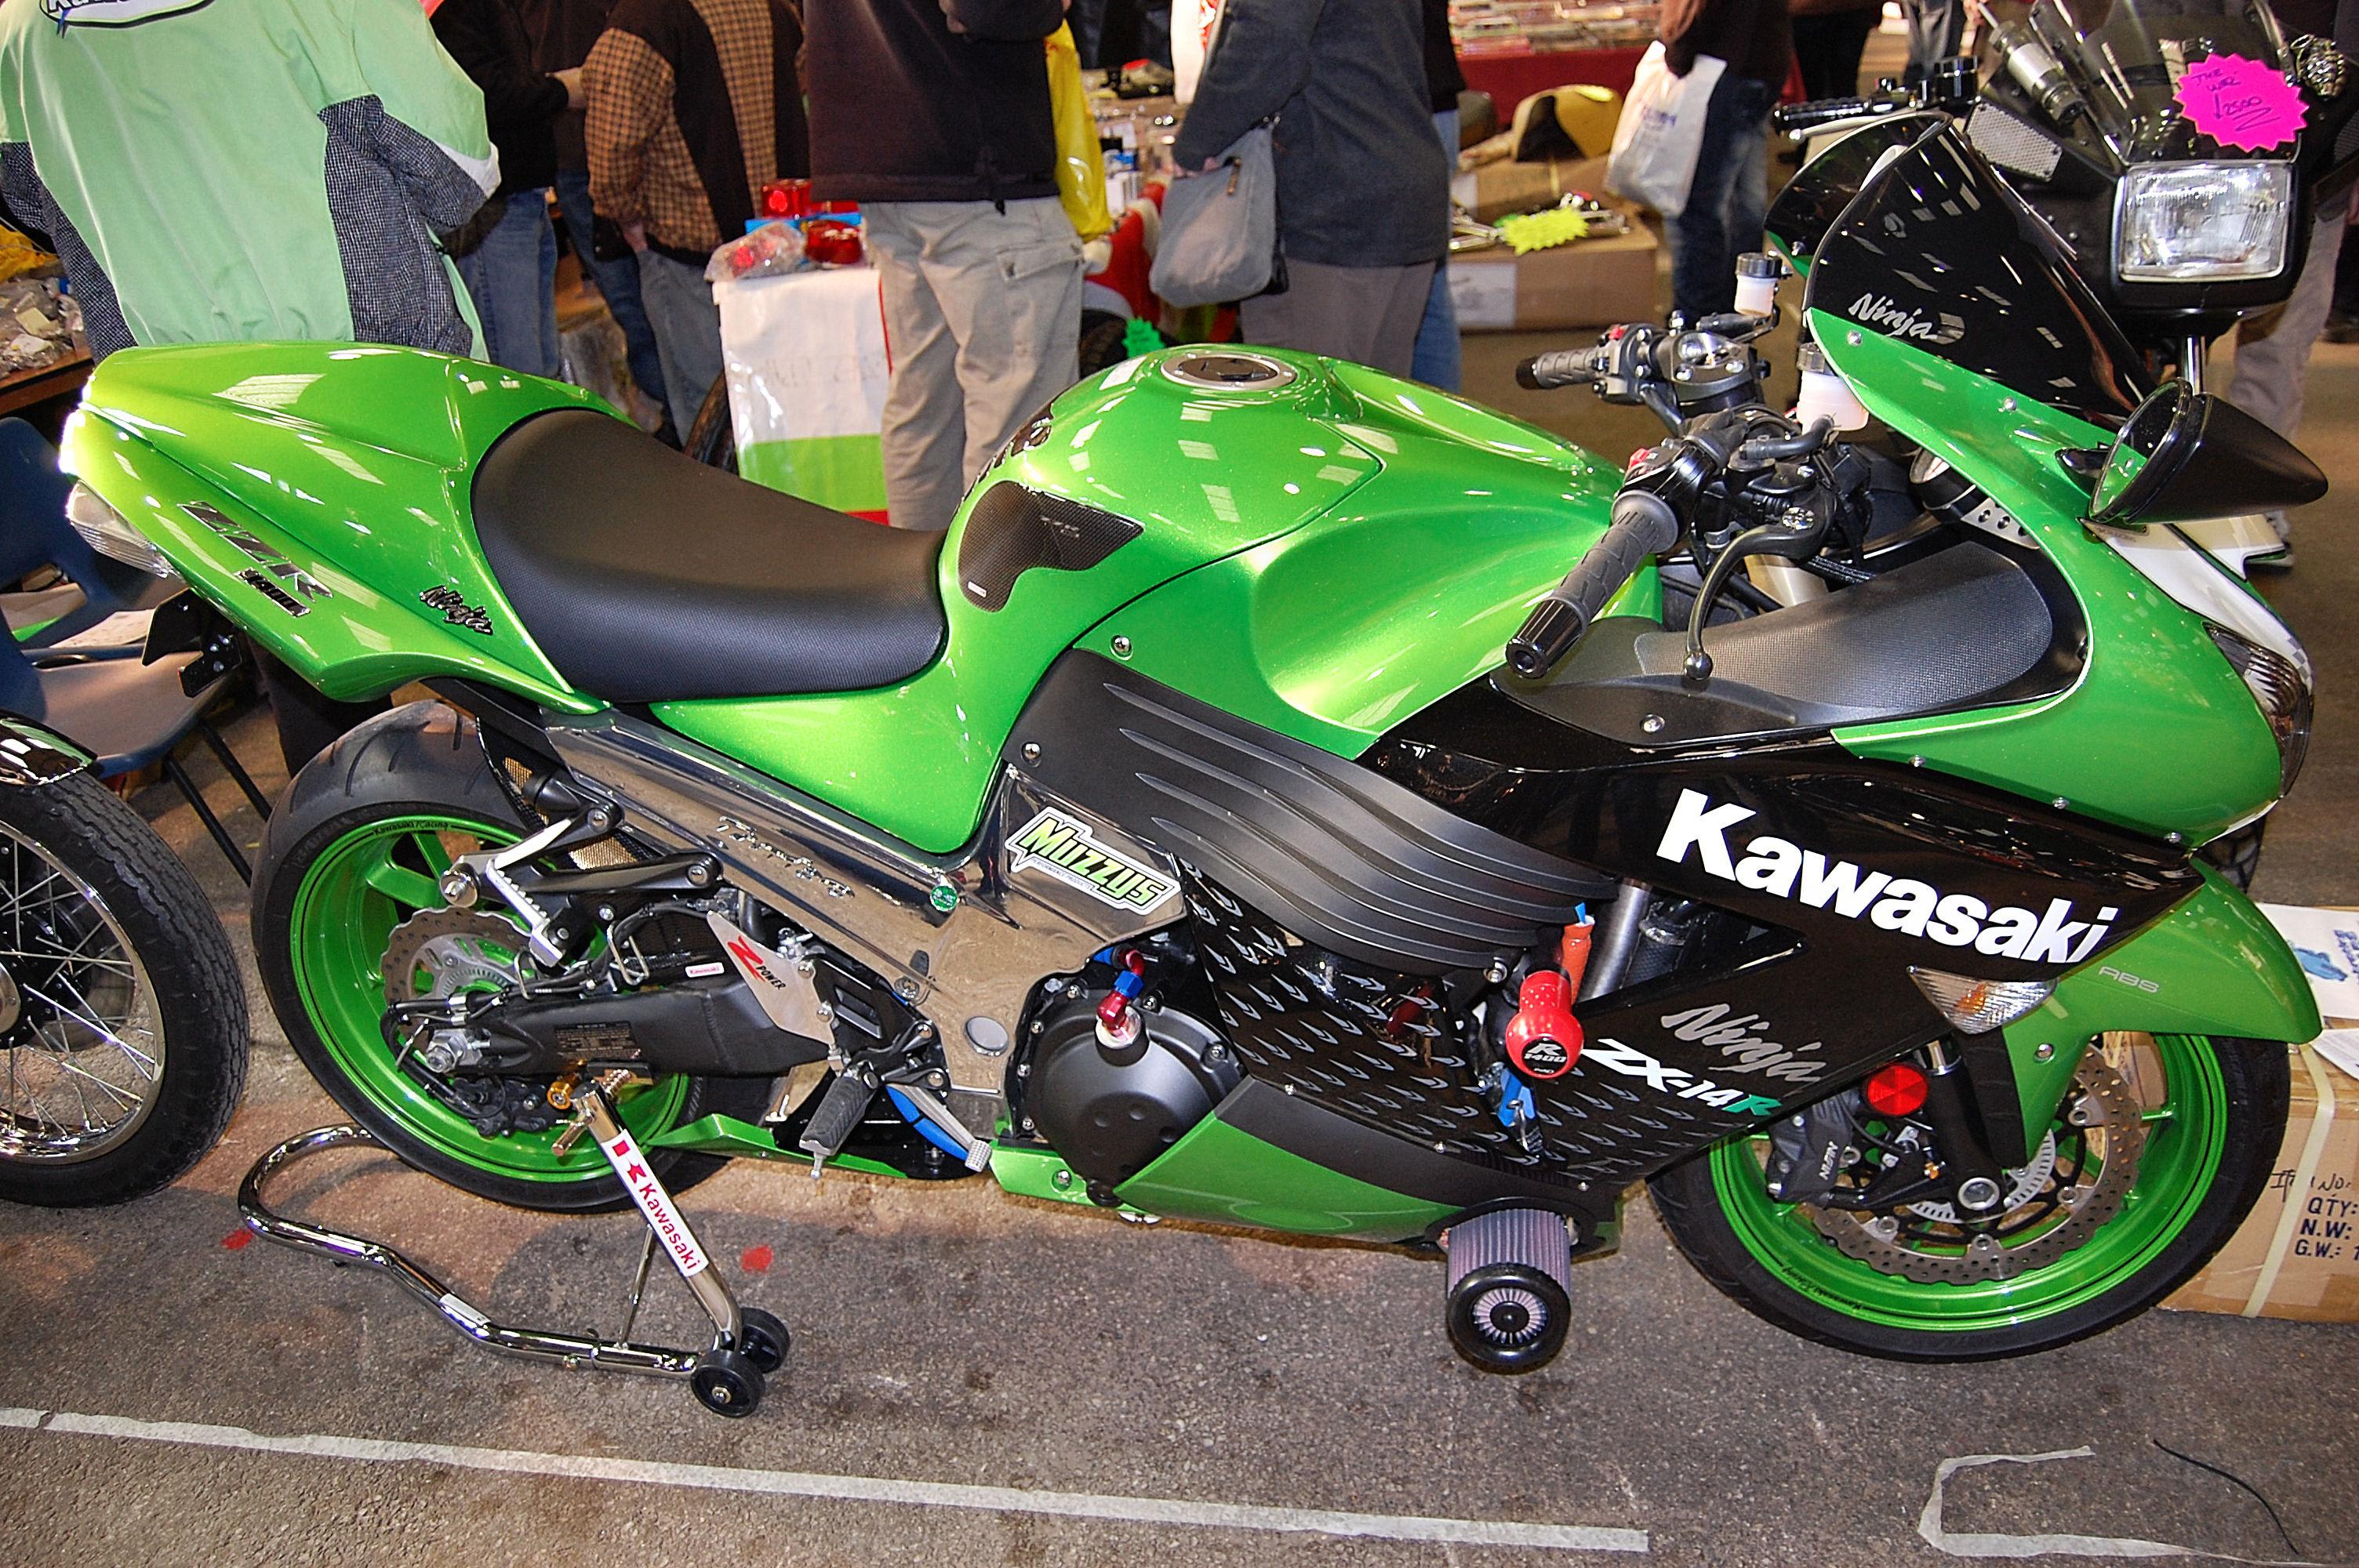 FileFlickr  ronsaunders47  KAWASAKI NINJA ZX14R THE GREEN